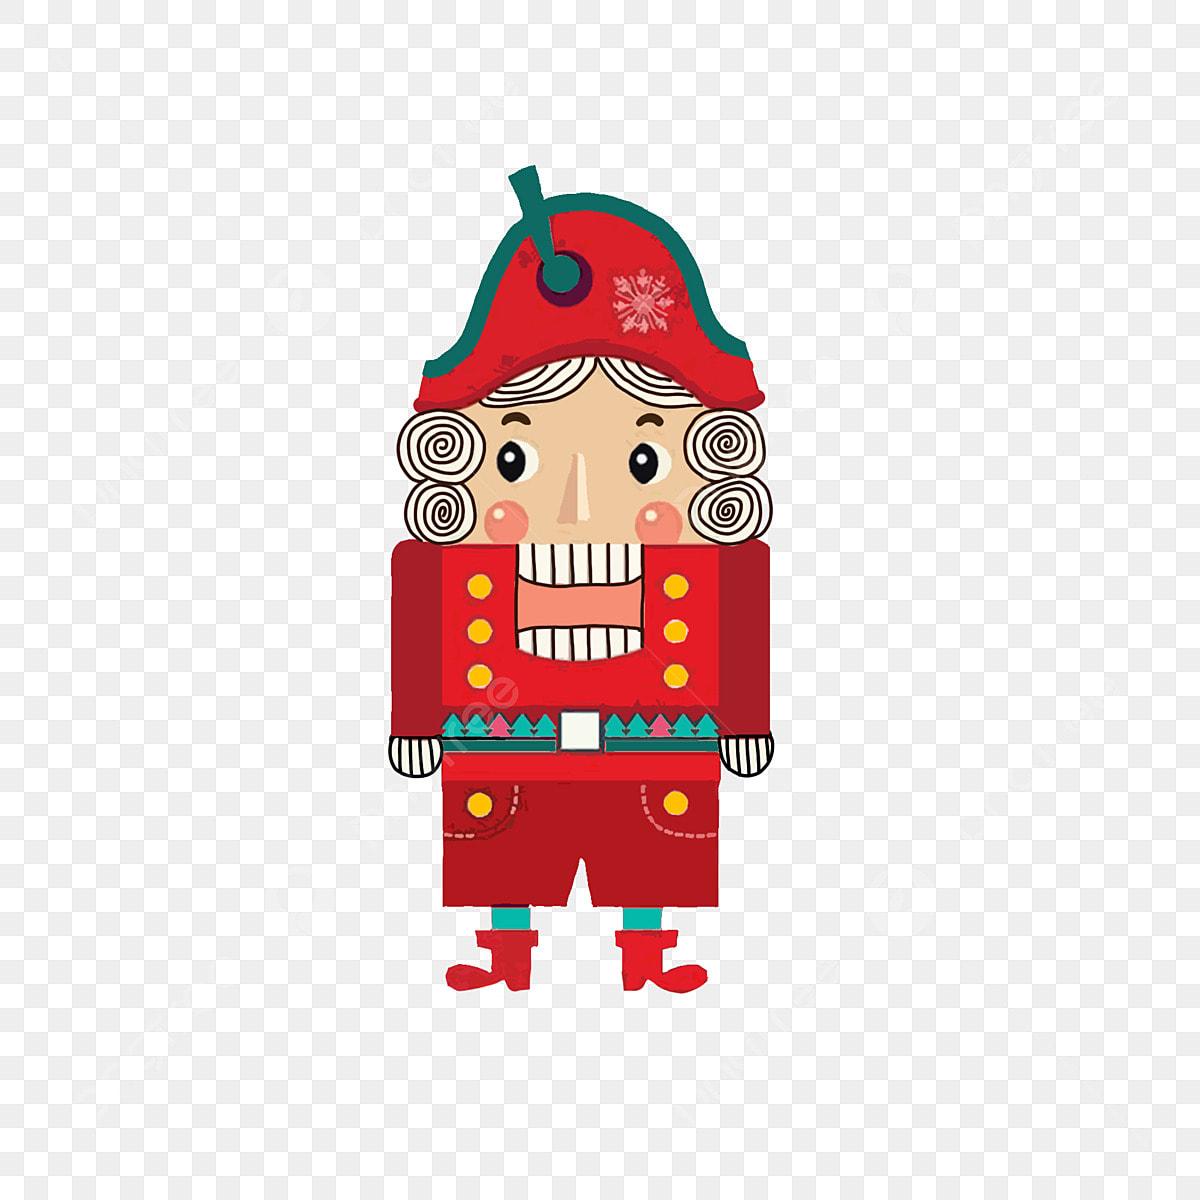 Nutcracker Christmas Tree Clipart.Nutcracker Knight Pine Christmas Gift Santa Claus Snowman